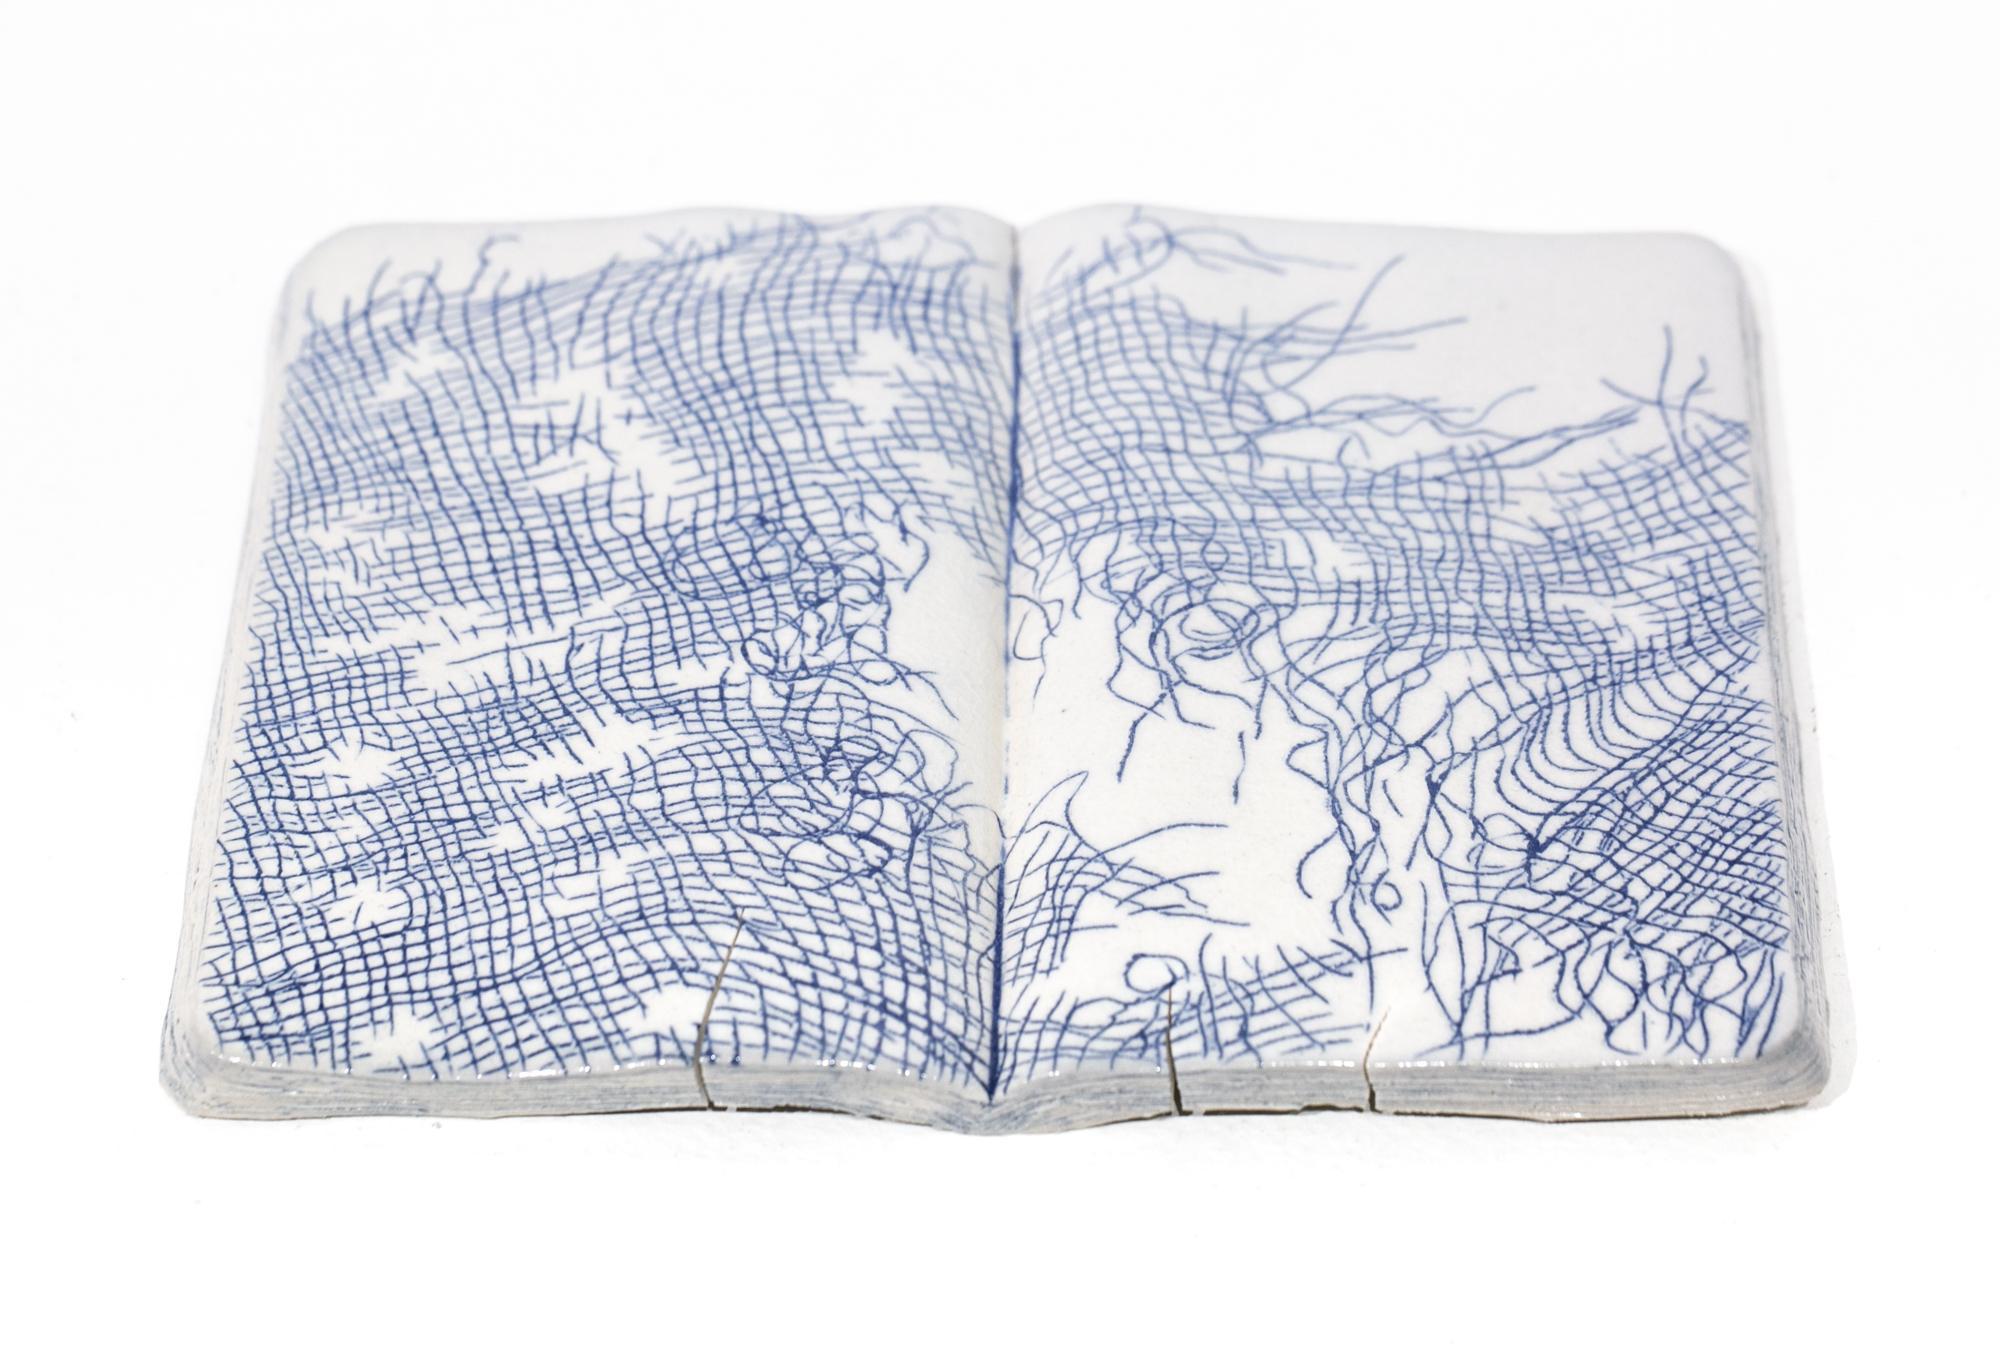 Sketchbook (small #10)